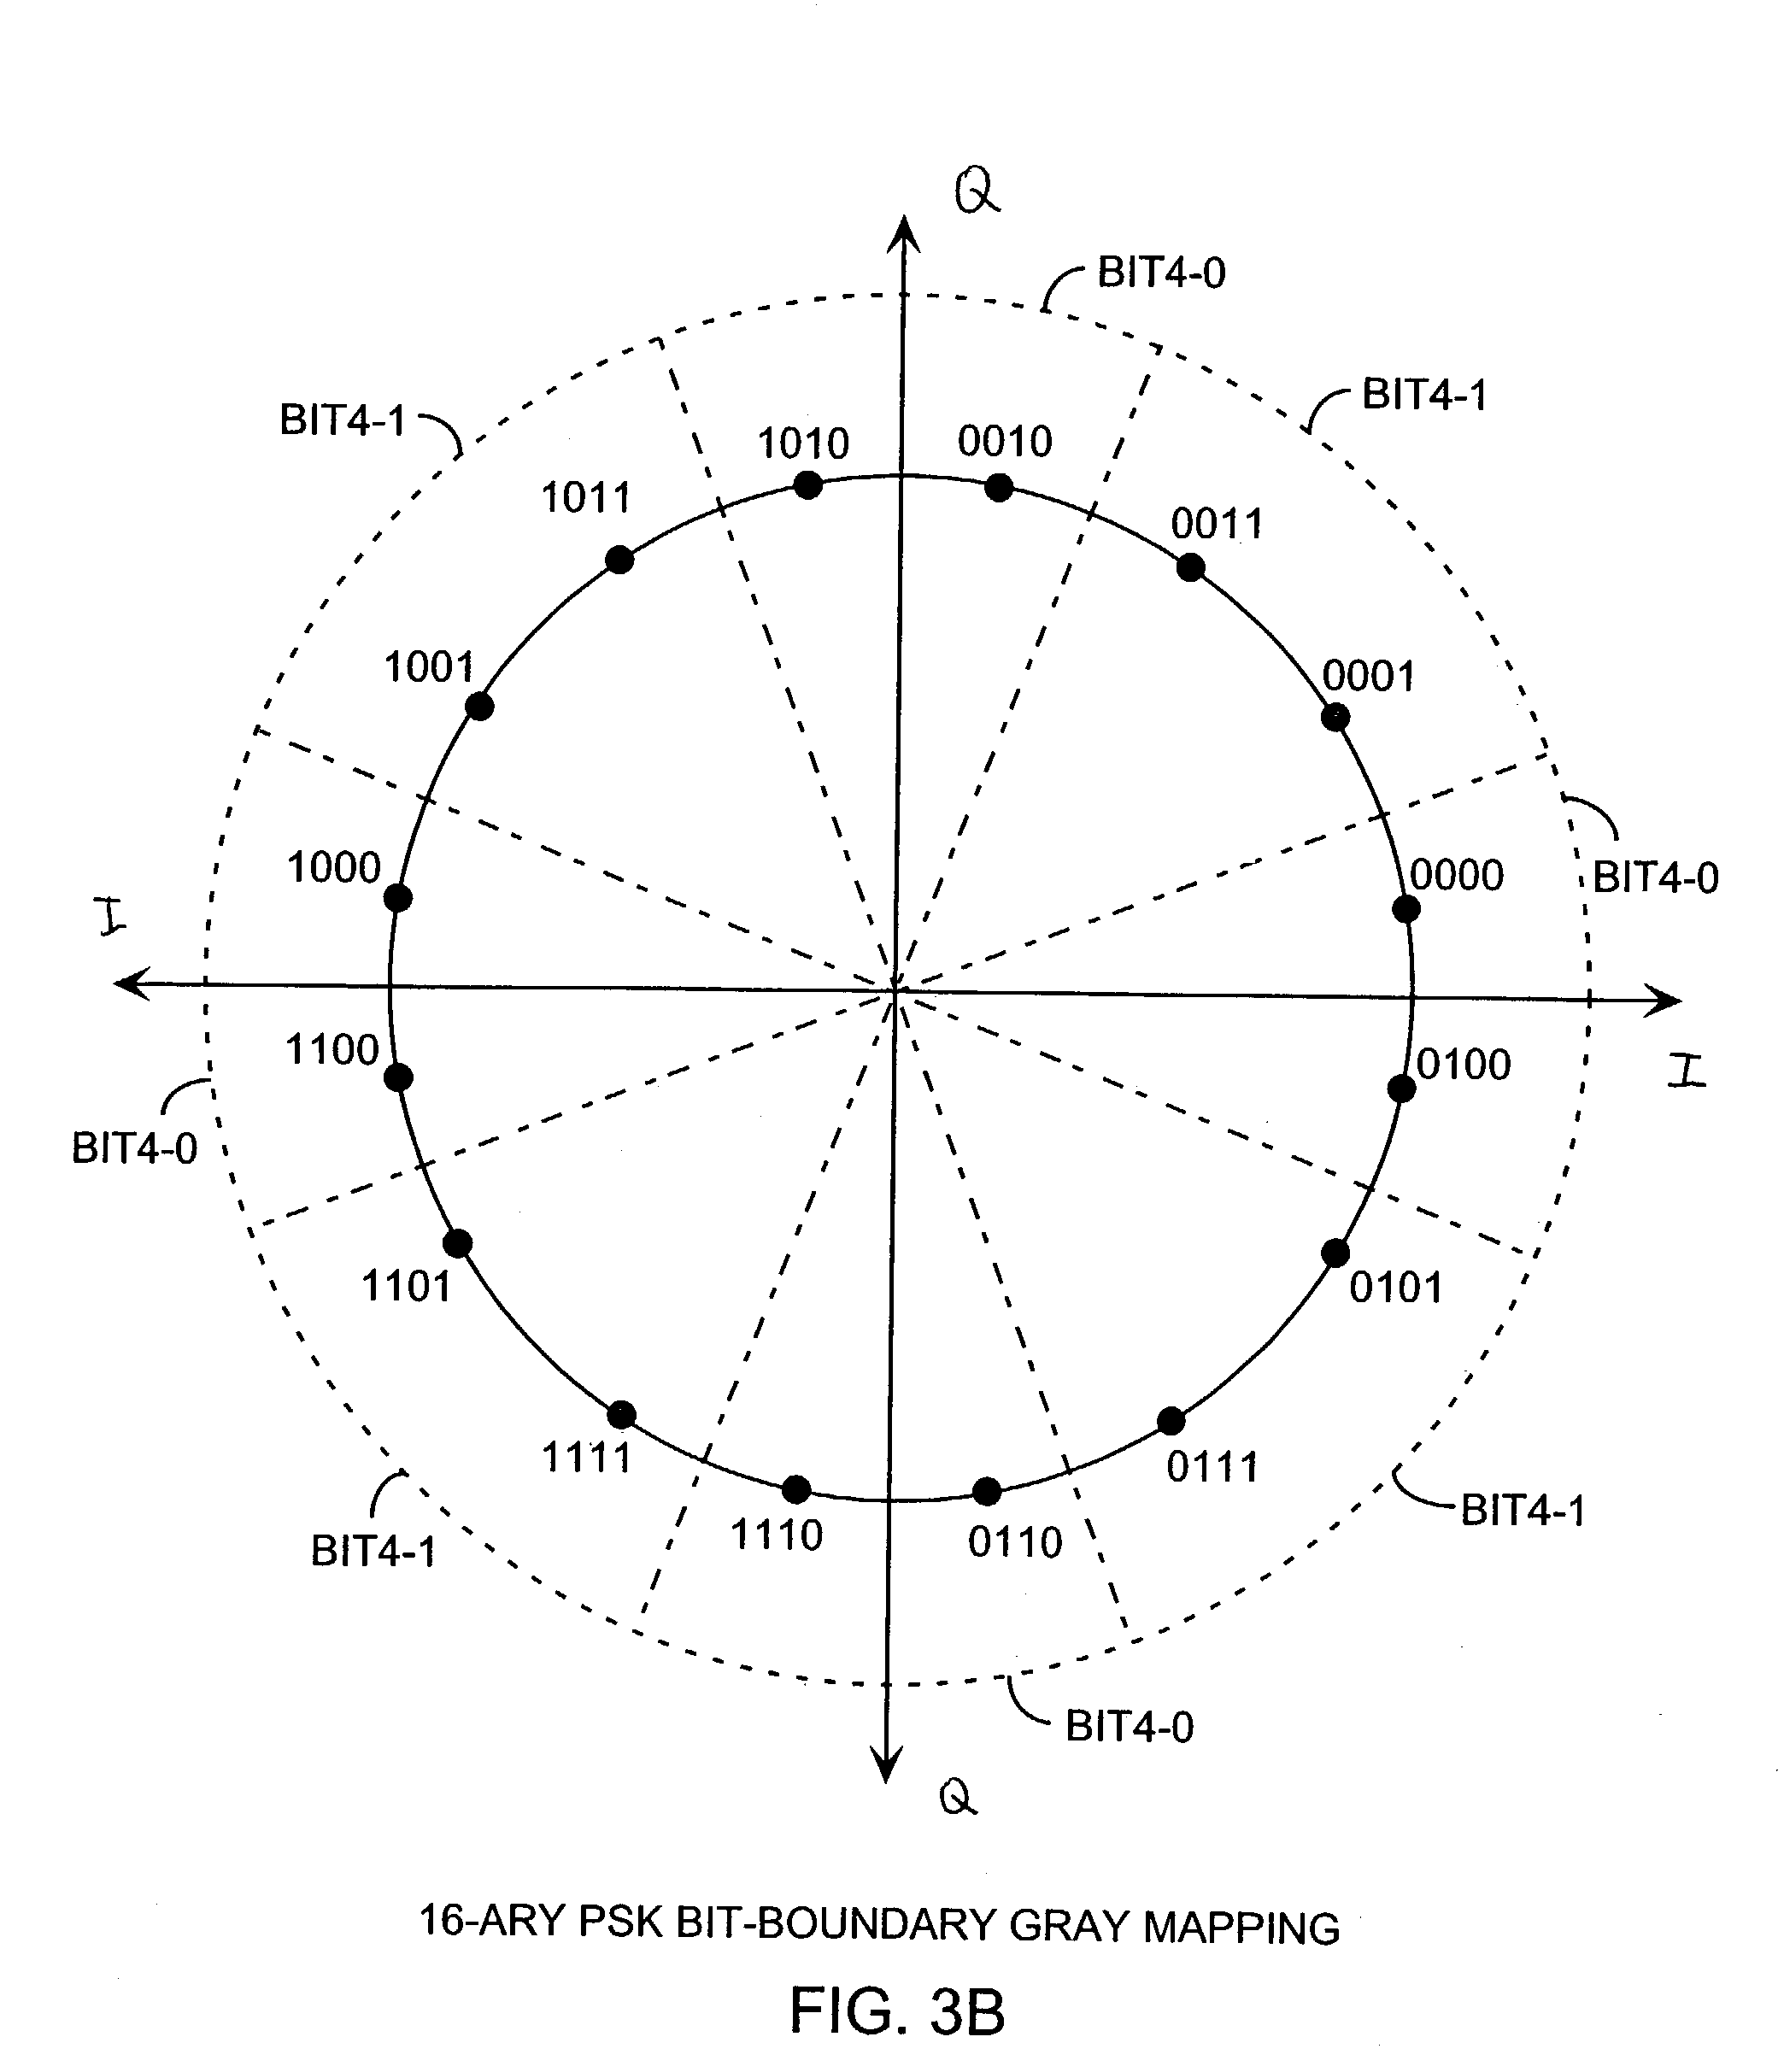 Qam block diagram the wiring diagram on wifi block diagram for m ary psk